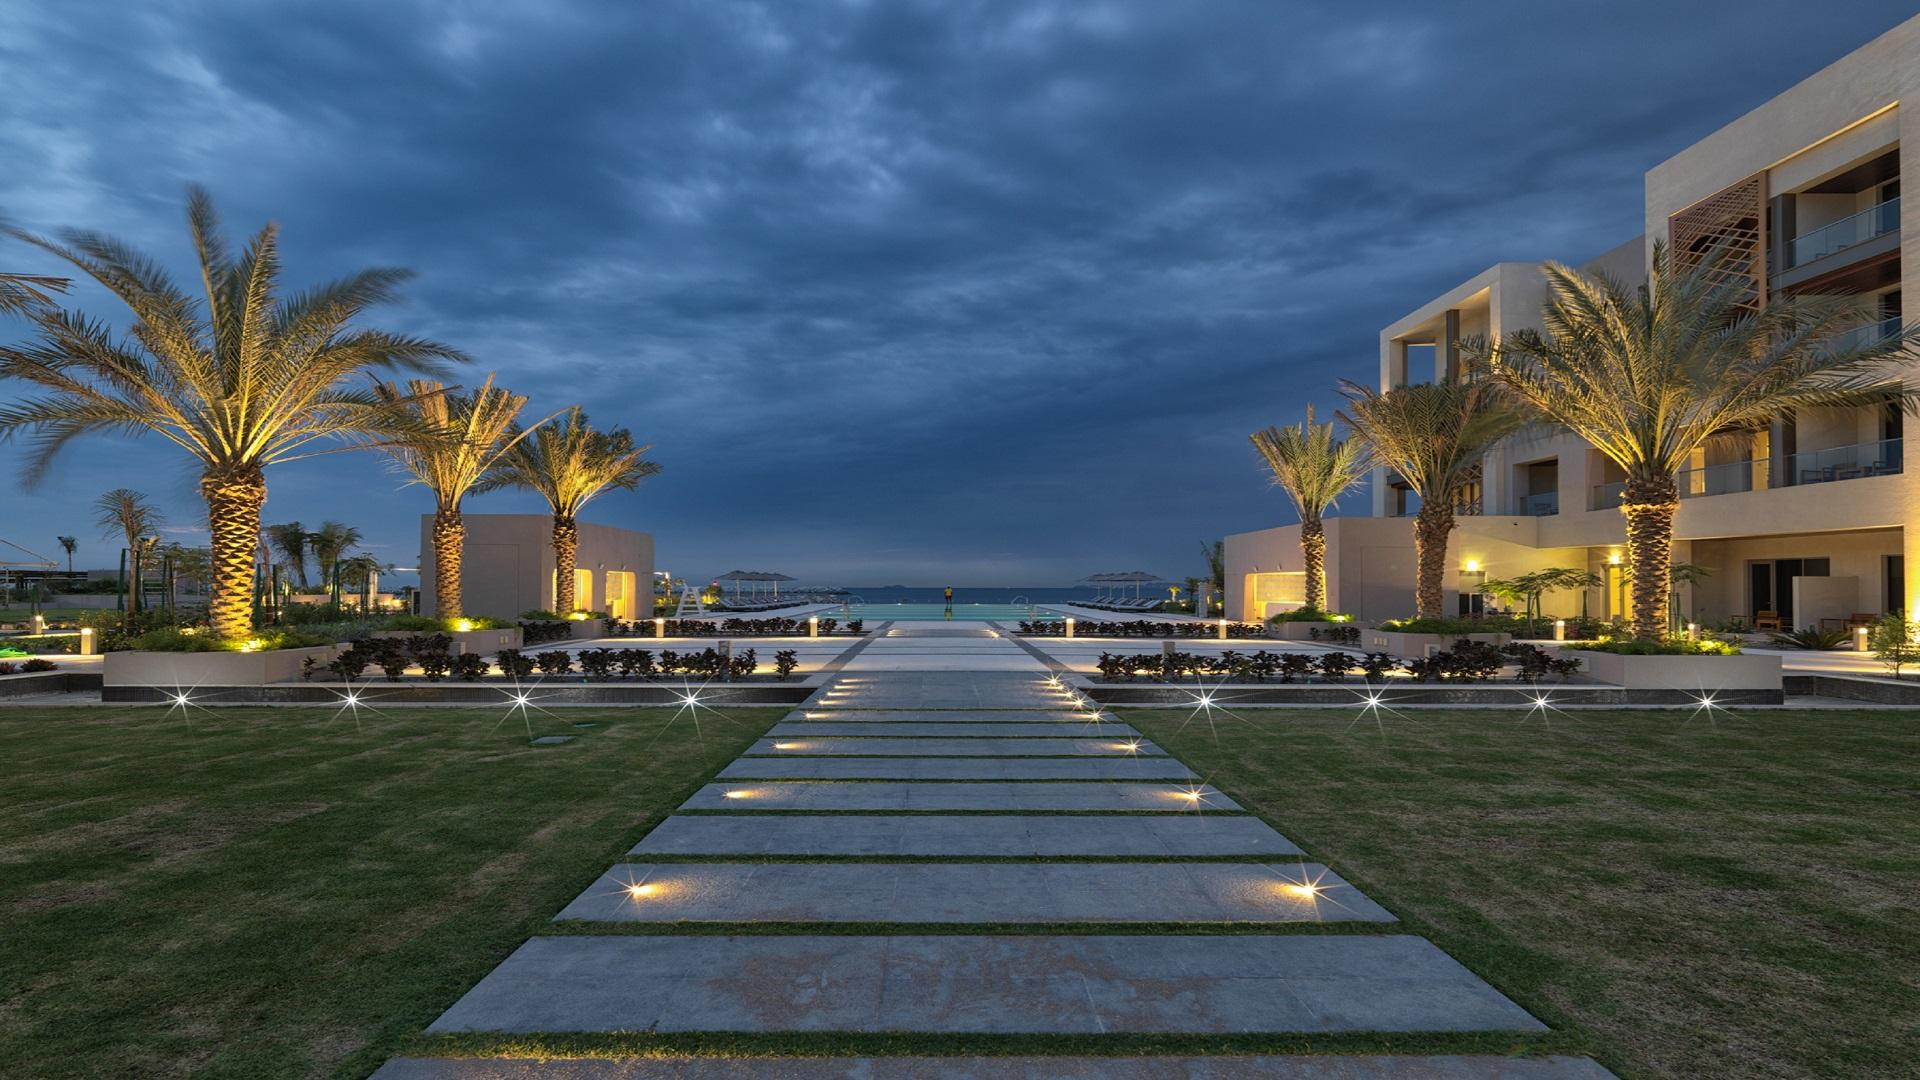 Kempinski Hotel Muscat: Dämmerung